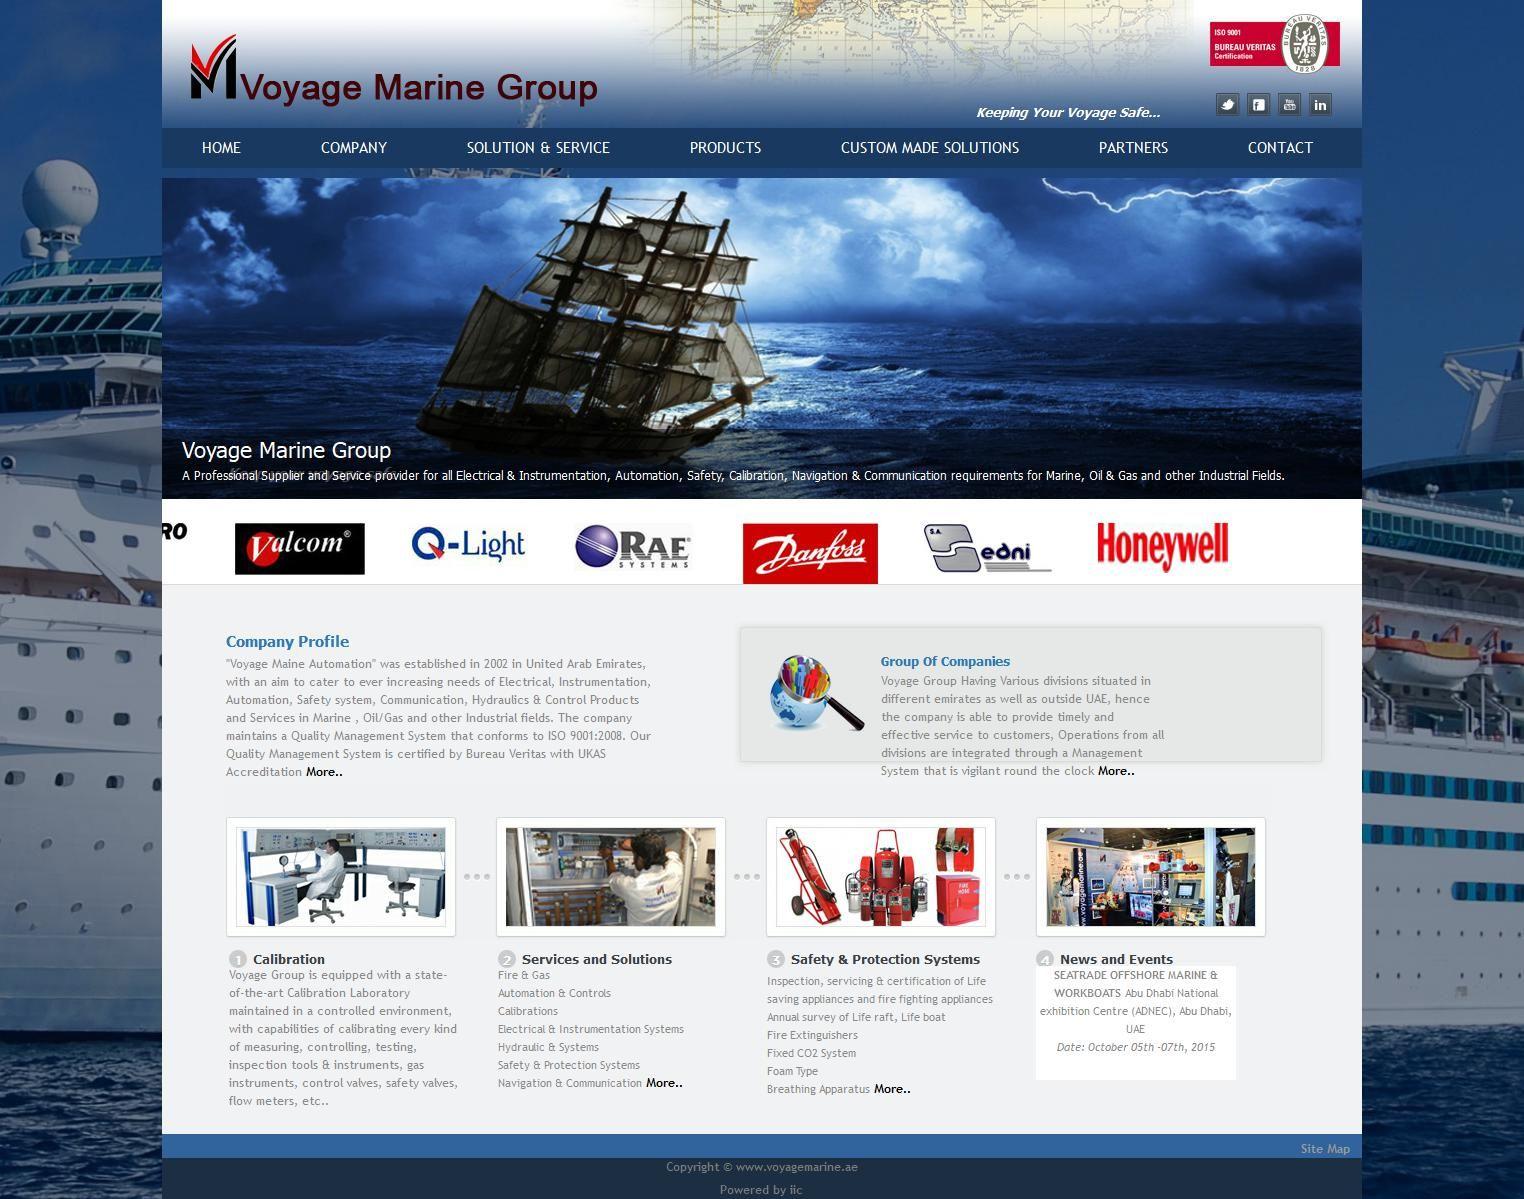 Voyage Marine Group Of Companies W01, Dubai Maritime City